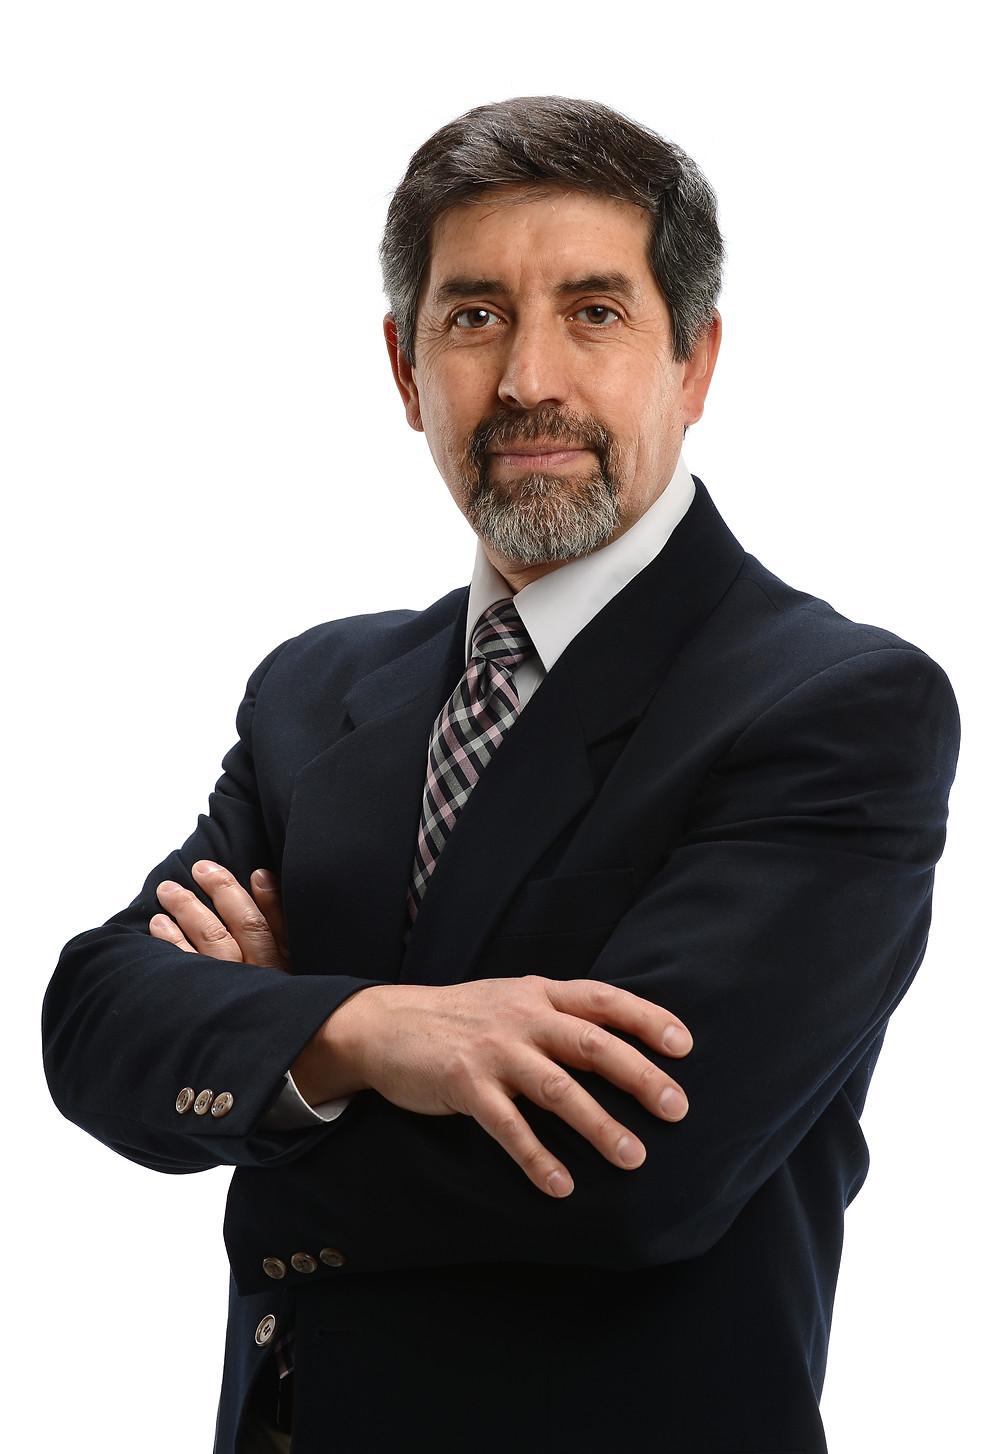 Joe Navarro, body language